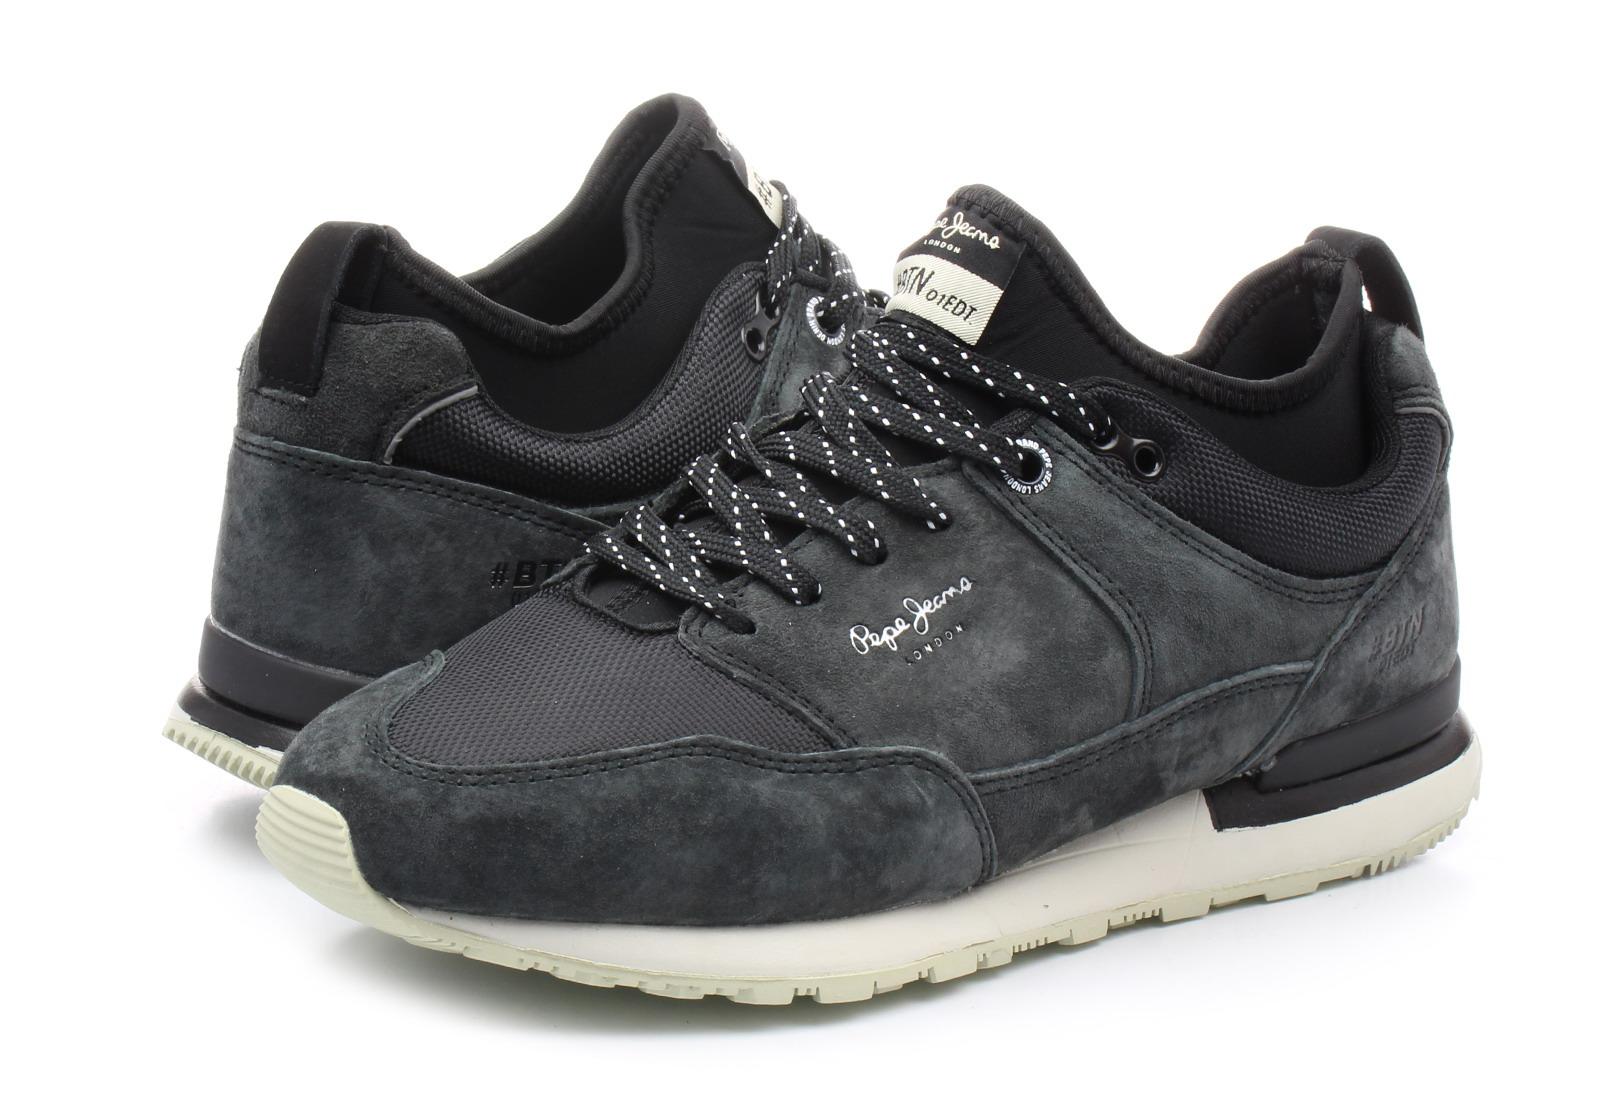 Pepe Jeans Cipő - Btn - PMS30474982 - Office Shoes Magyarország e3d9505cd1